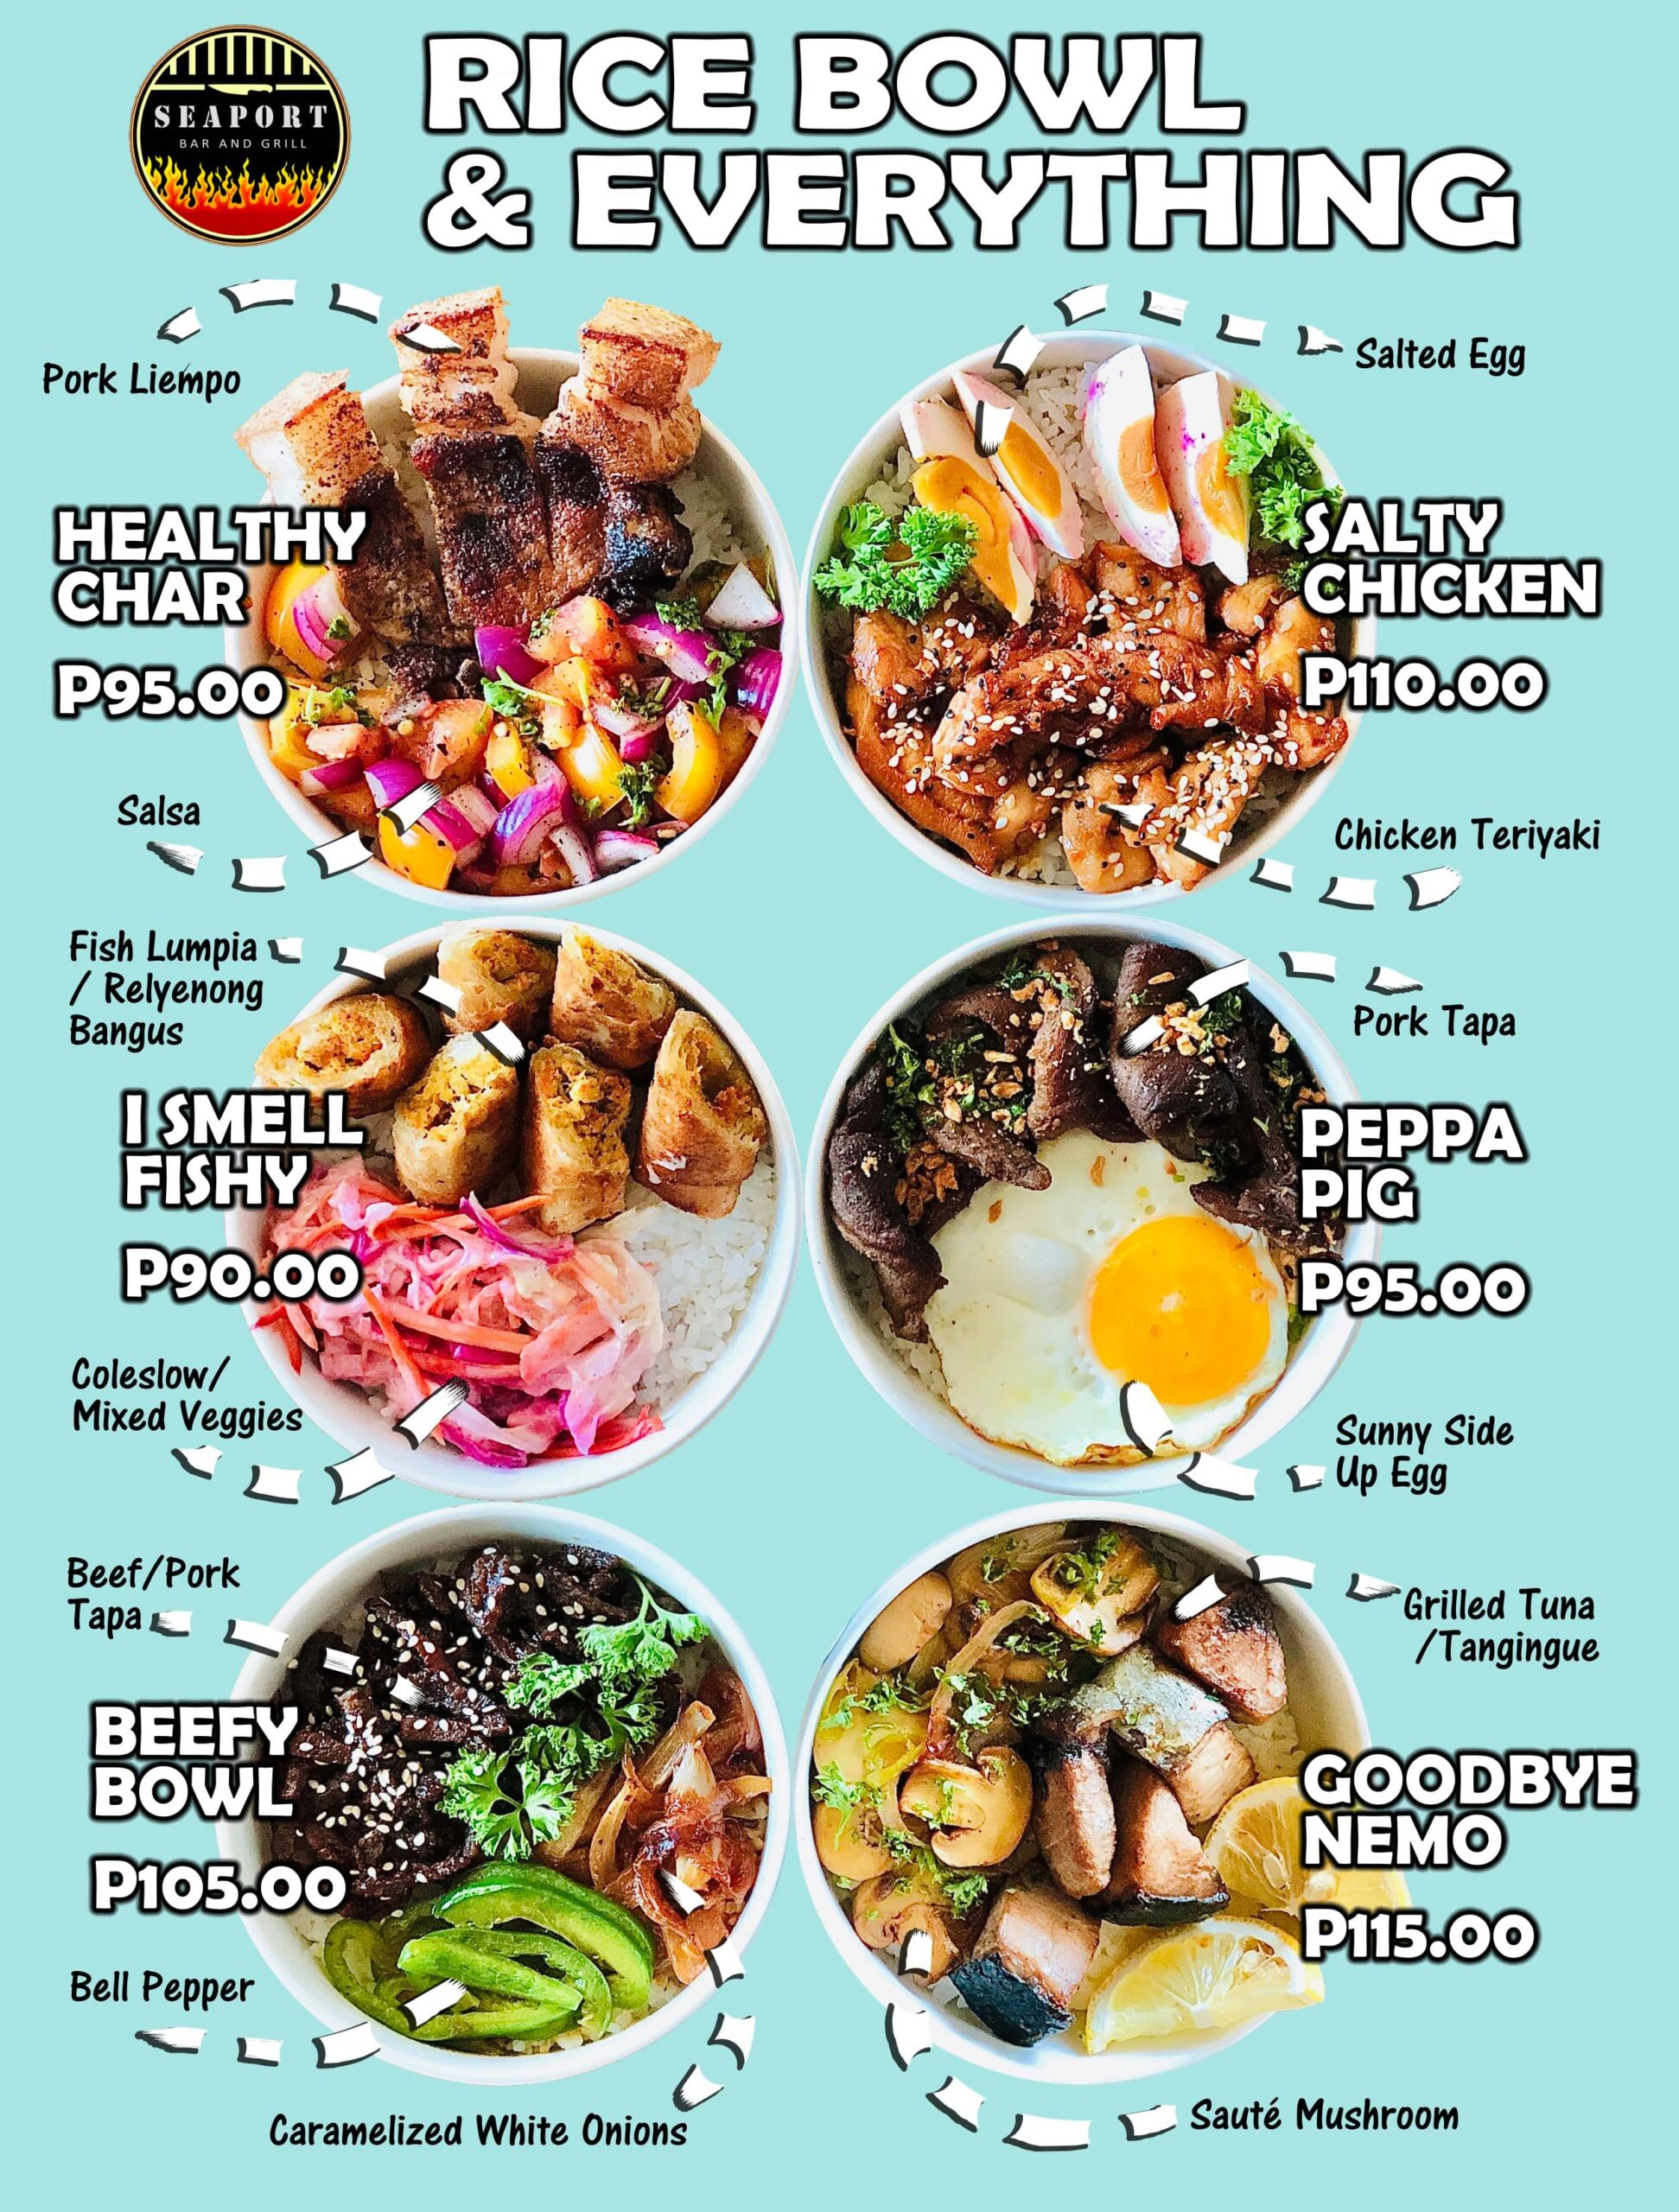 seaport bar and grill romblon philippines (2)